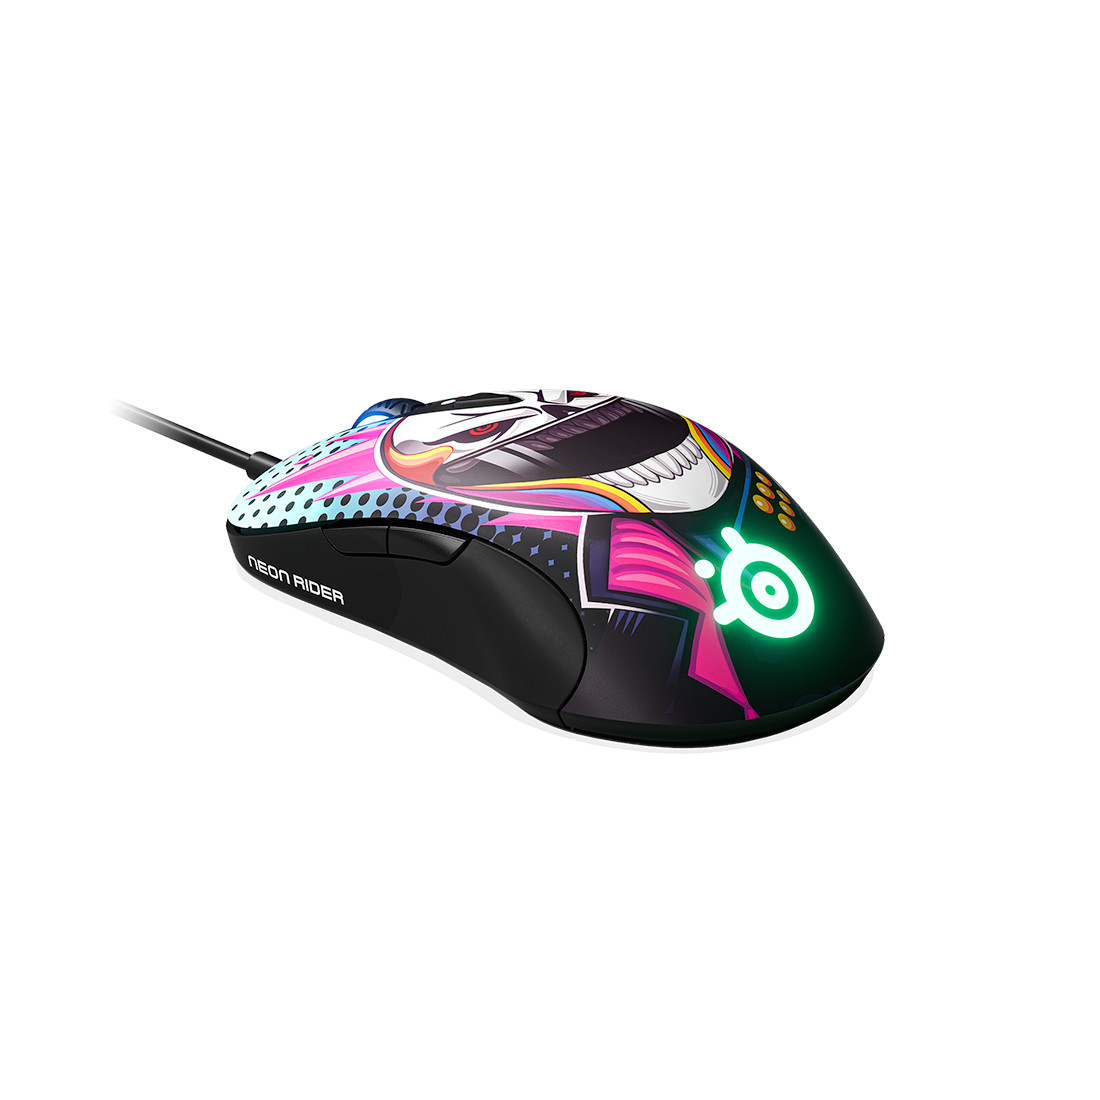 Компьютерная мышь Steelseries Sensei Ten Neon Rider Edition